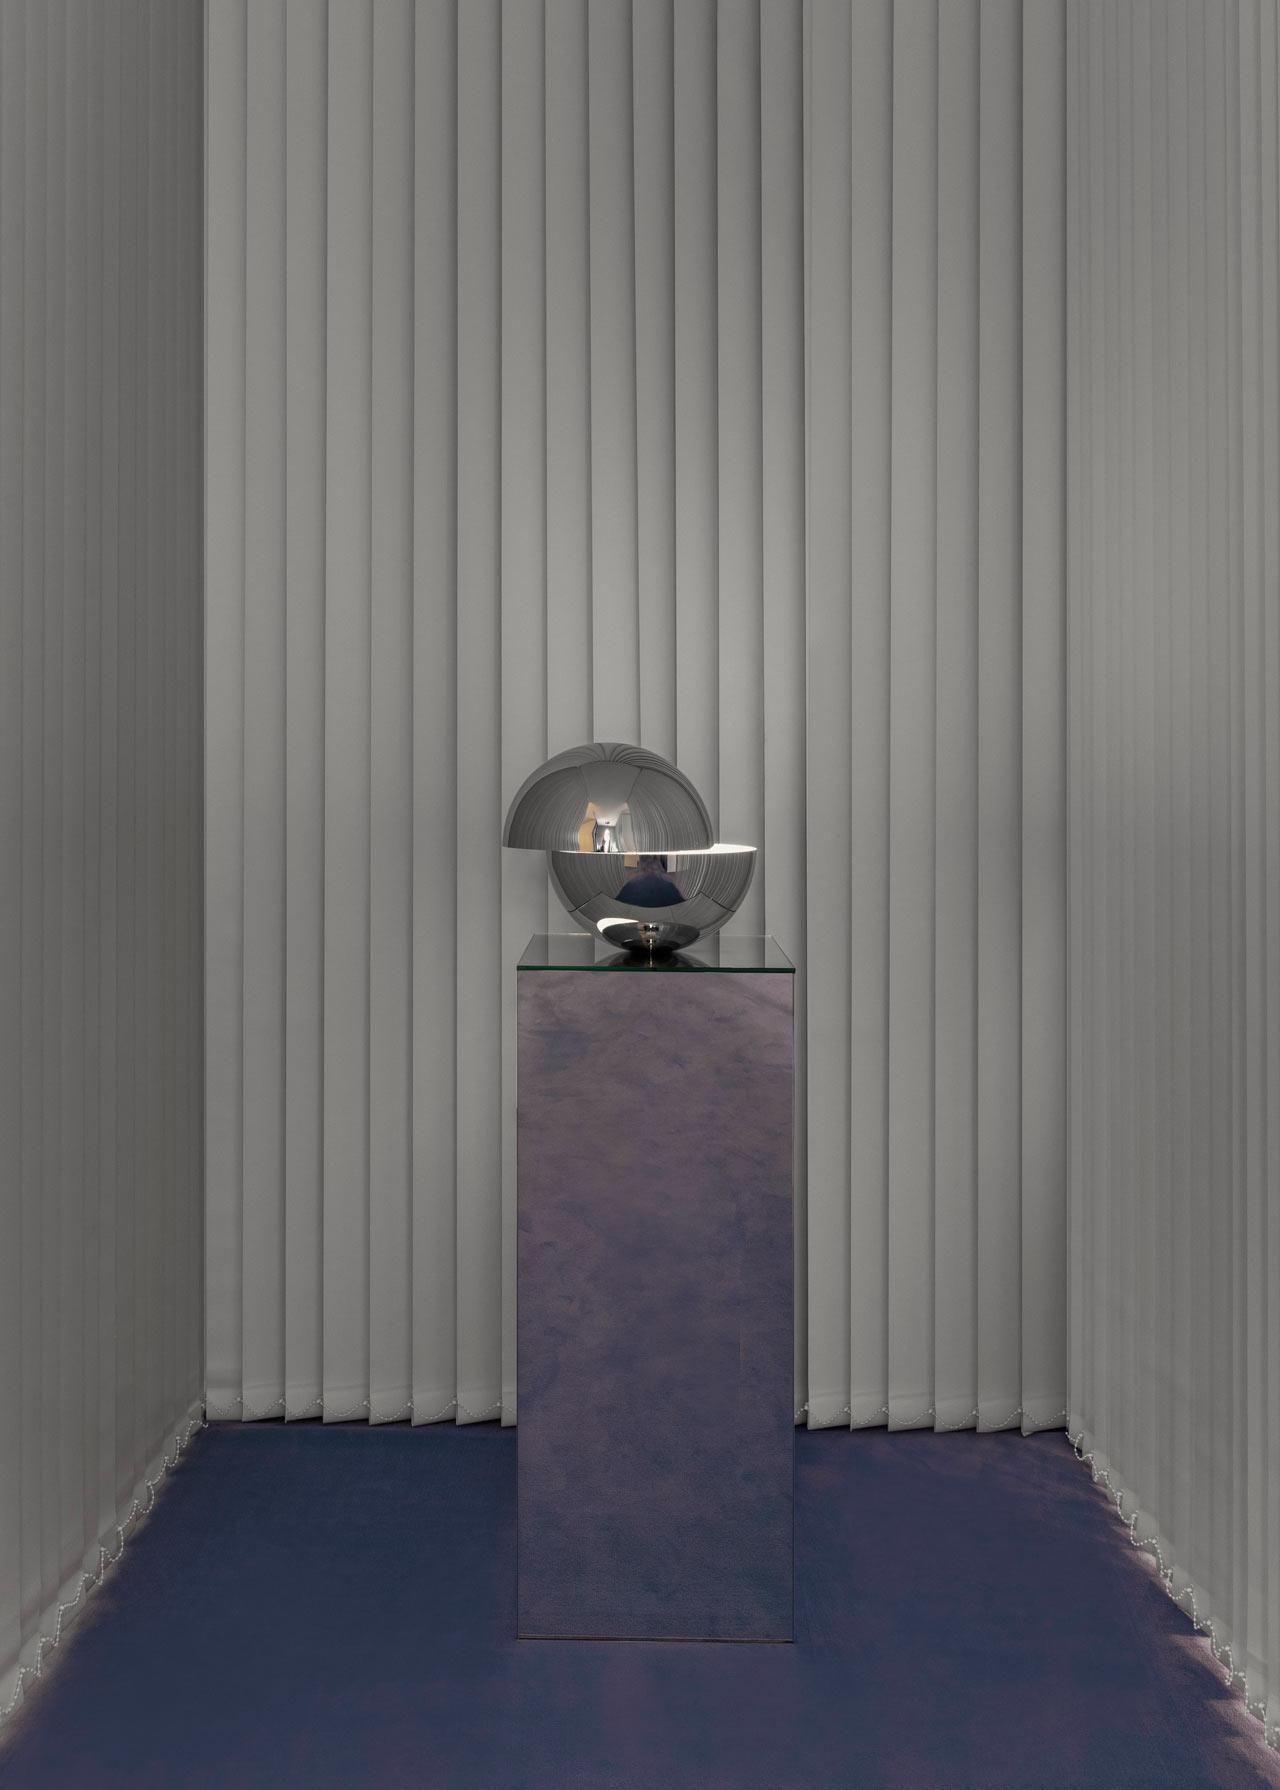 Lee-Broom-Observatory-London-11.jpg